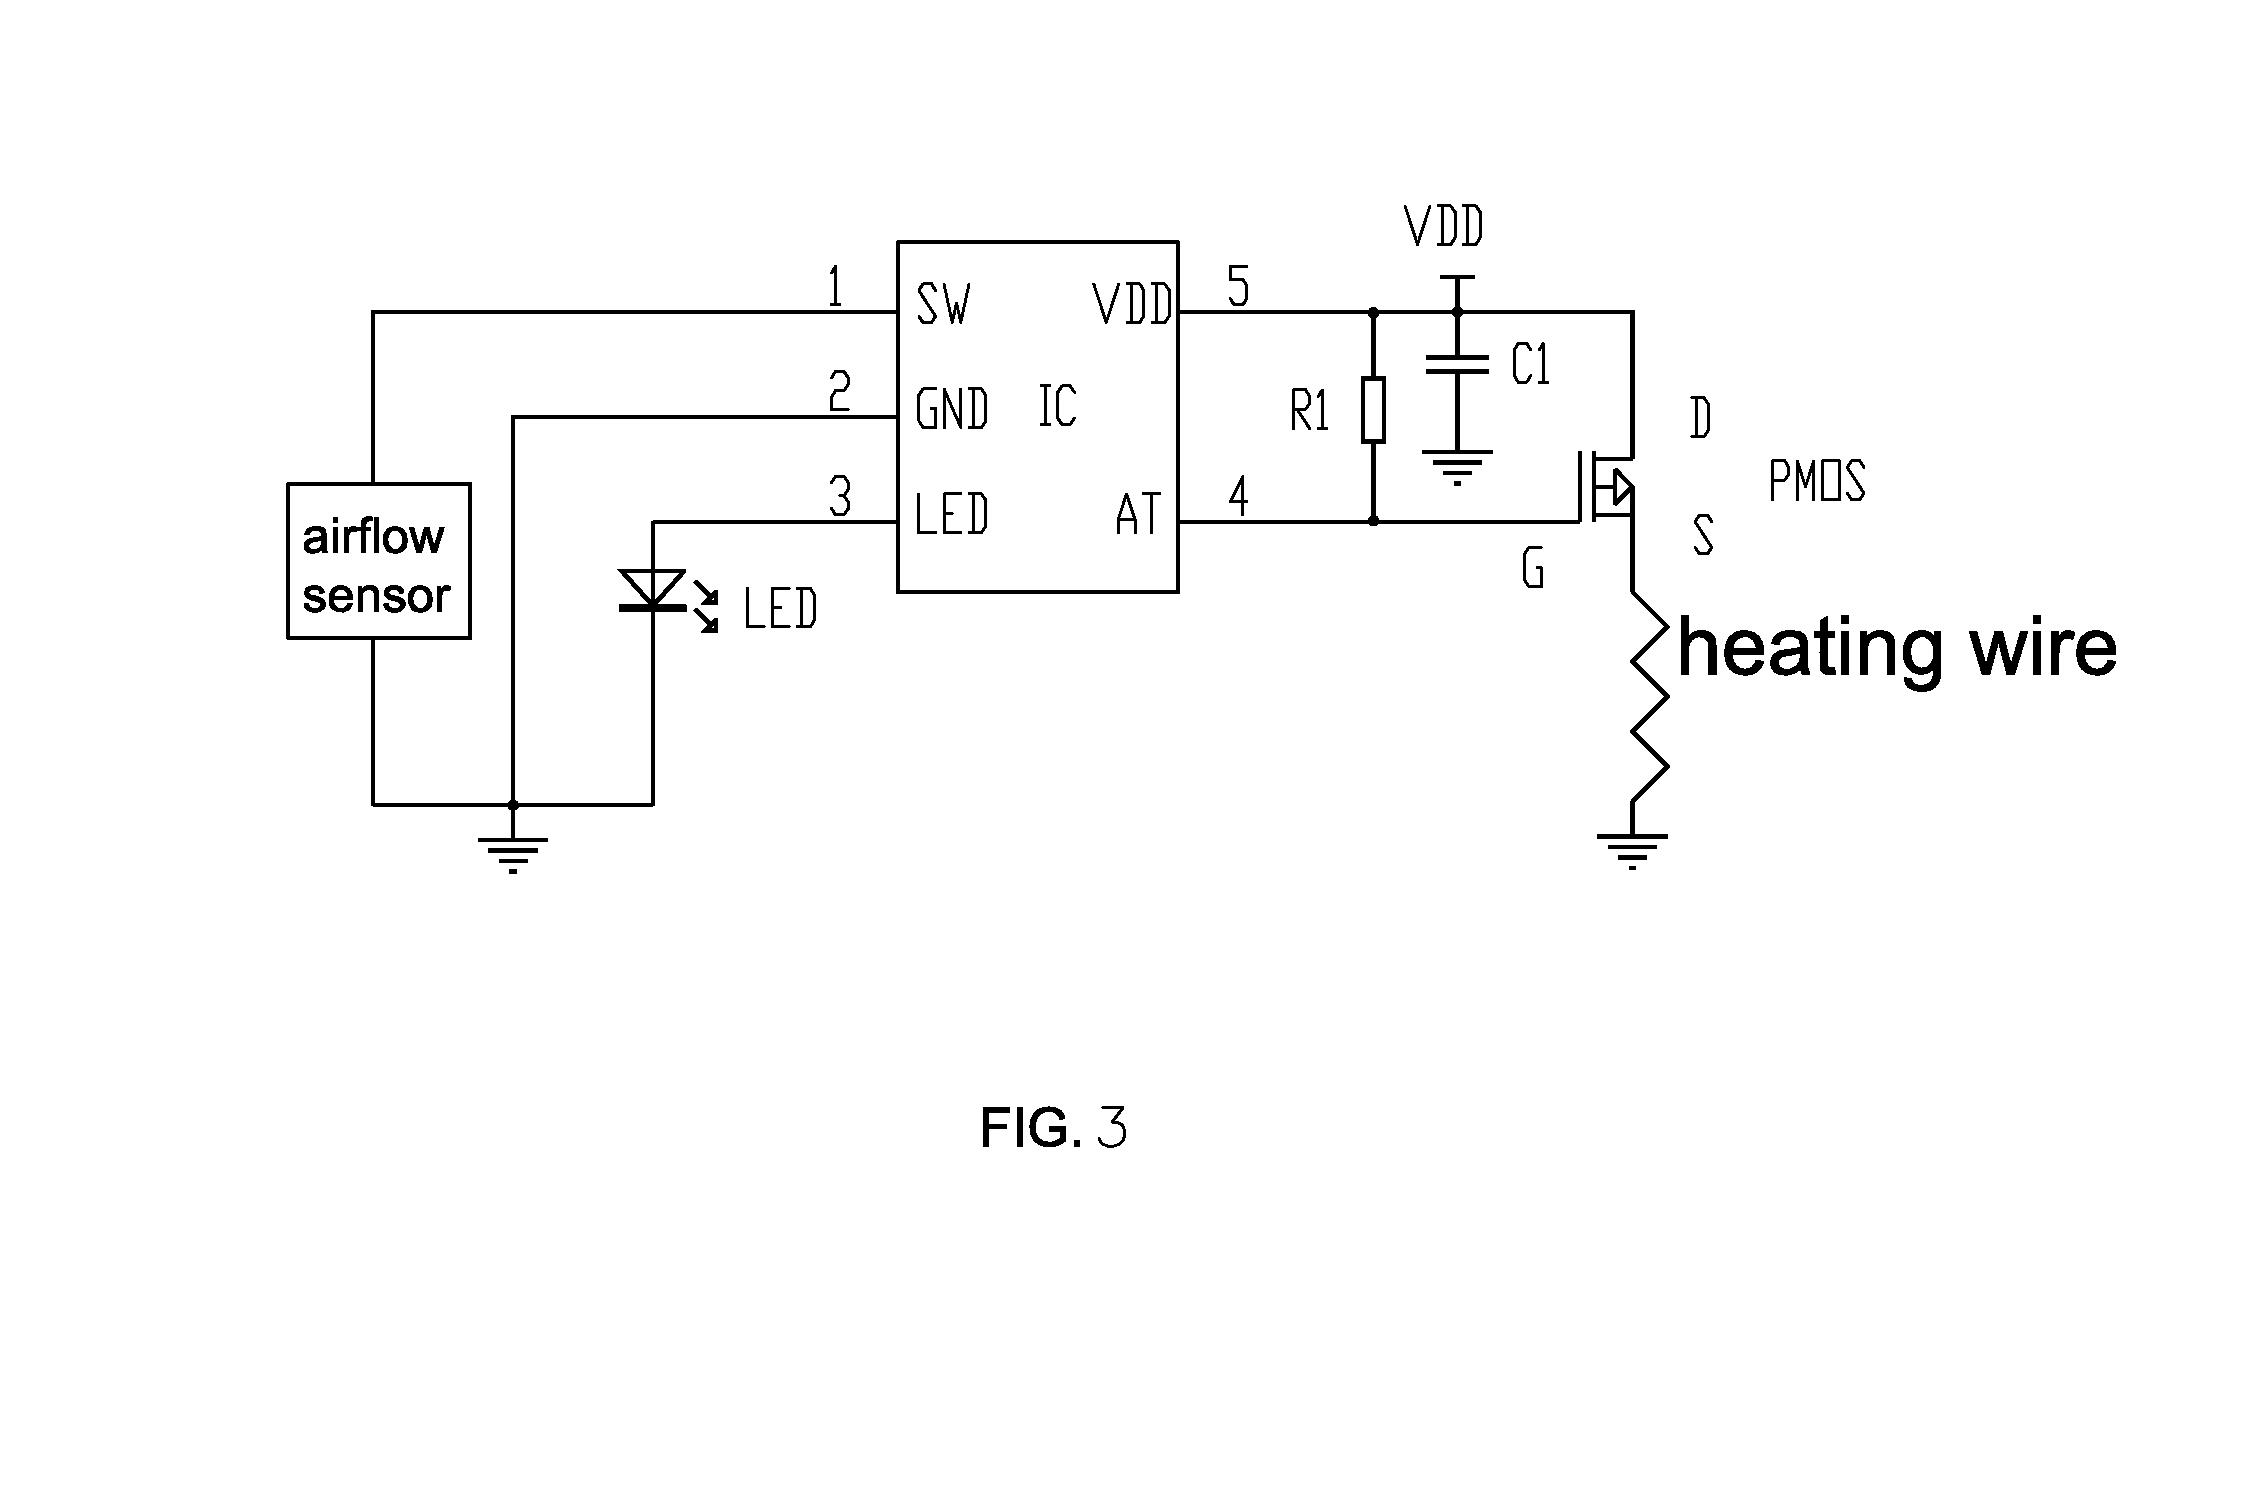 e cig diagram wire data schema u2022 rh fullventas co Types of E Cigs E-Cig Coil Diagram